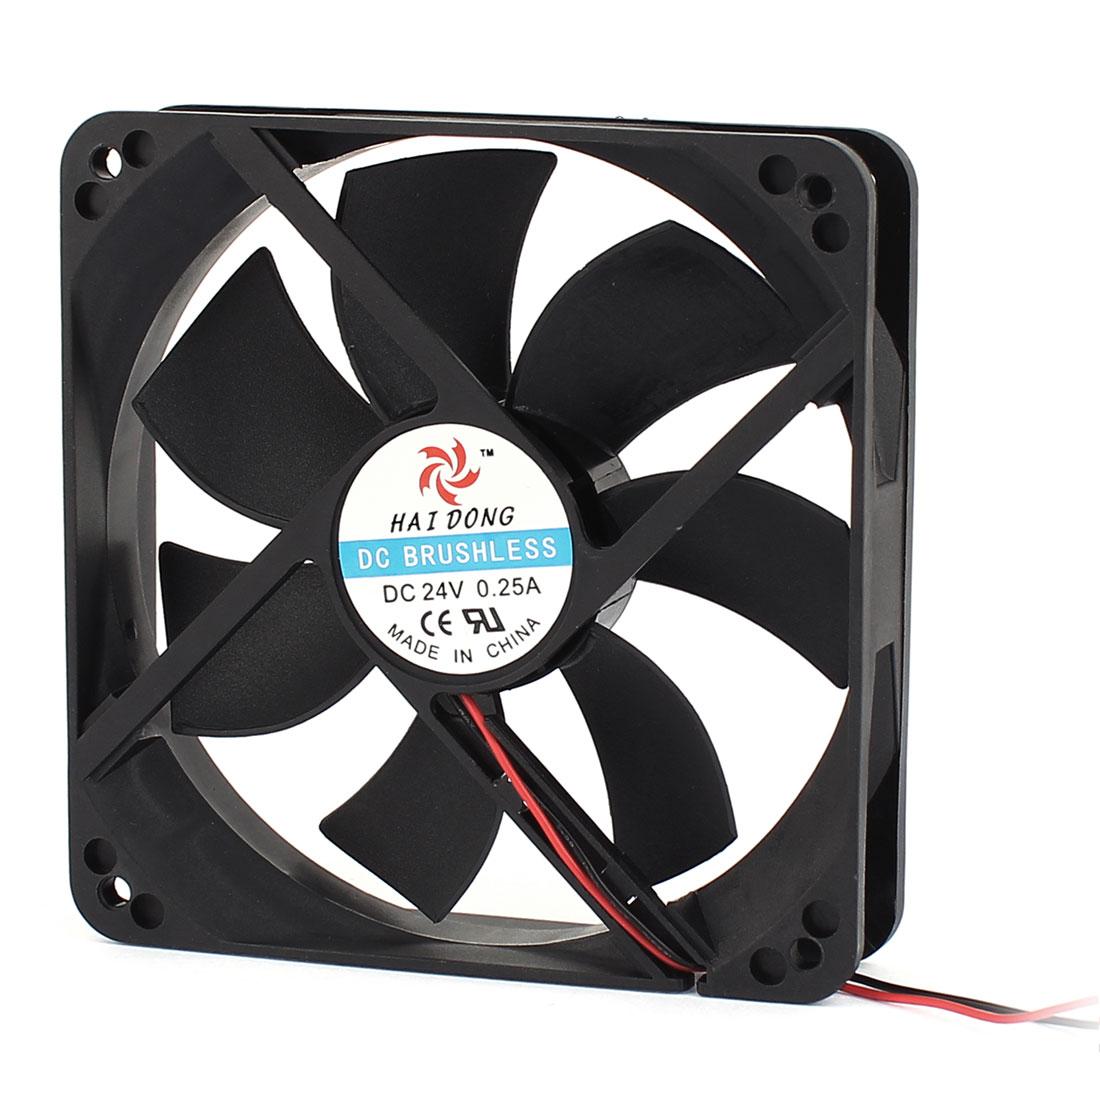 DC 24V 0.25A PC CPU Computer Cooling Fan 120 x 120 x 23mm w Metal Mesh